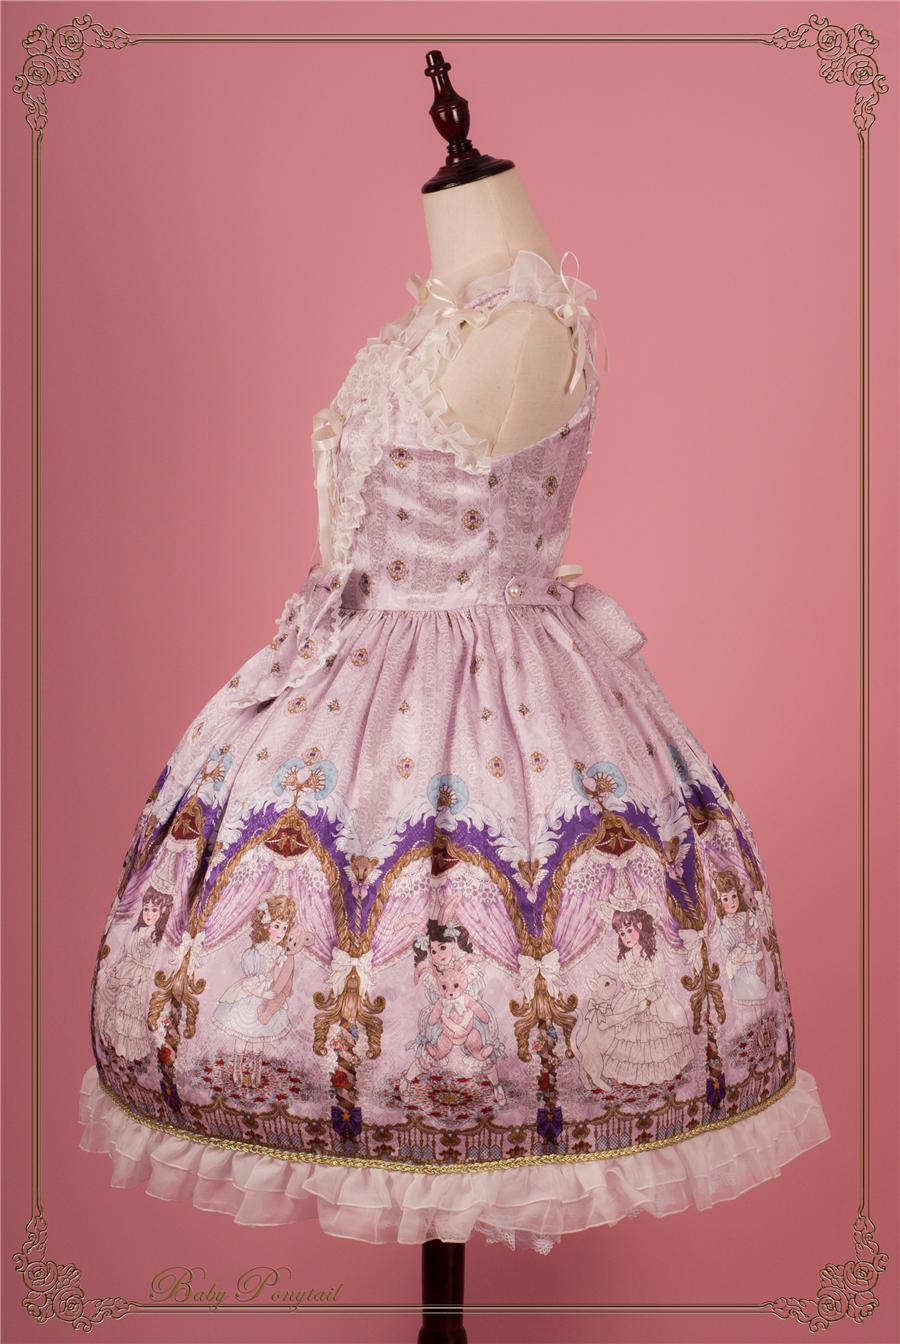 BabyPonytail_Stock Photo_My Favorite Companion_JSK Lavender_10_副本.jpg